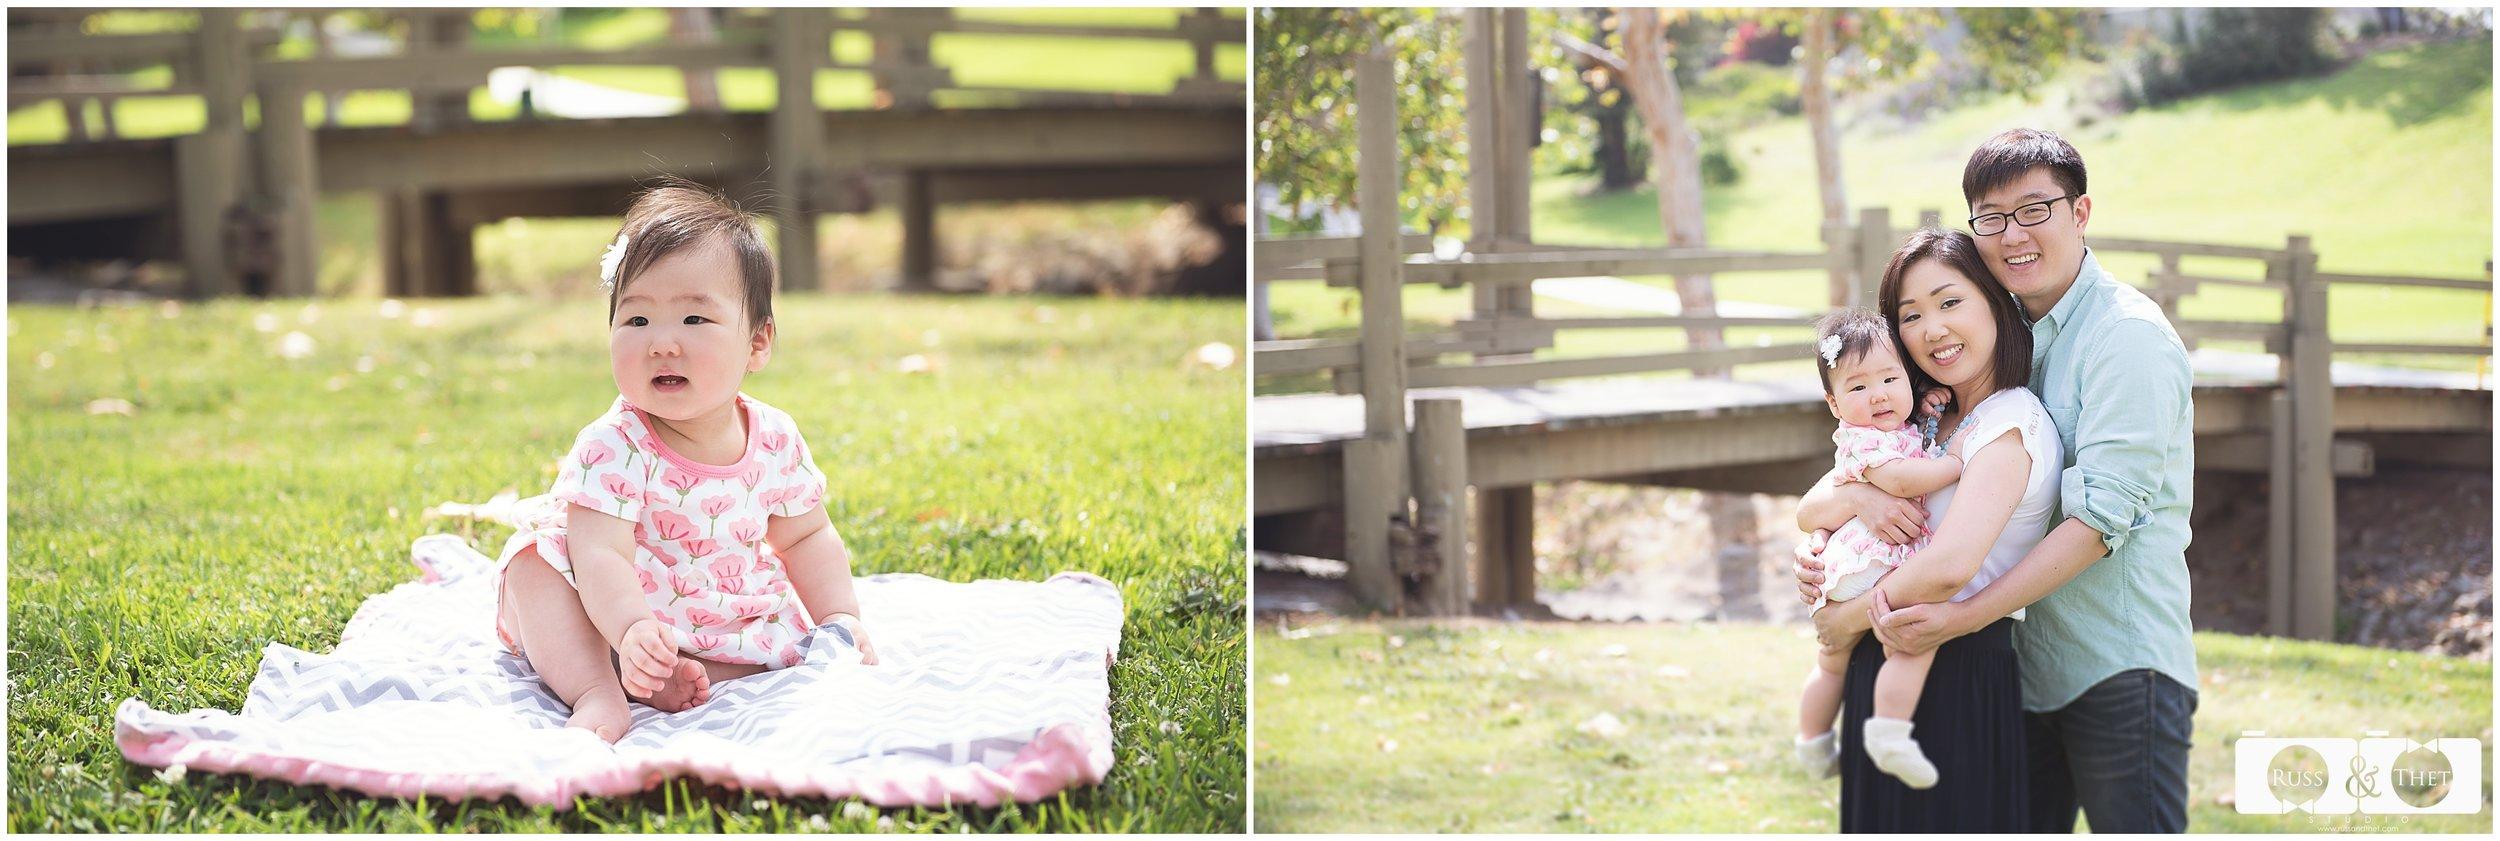 La-Mirada-Creek-Park-Family-Maternity-Kids-Portraits (10).jpg